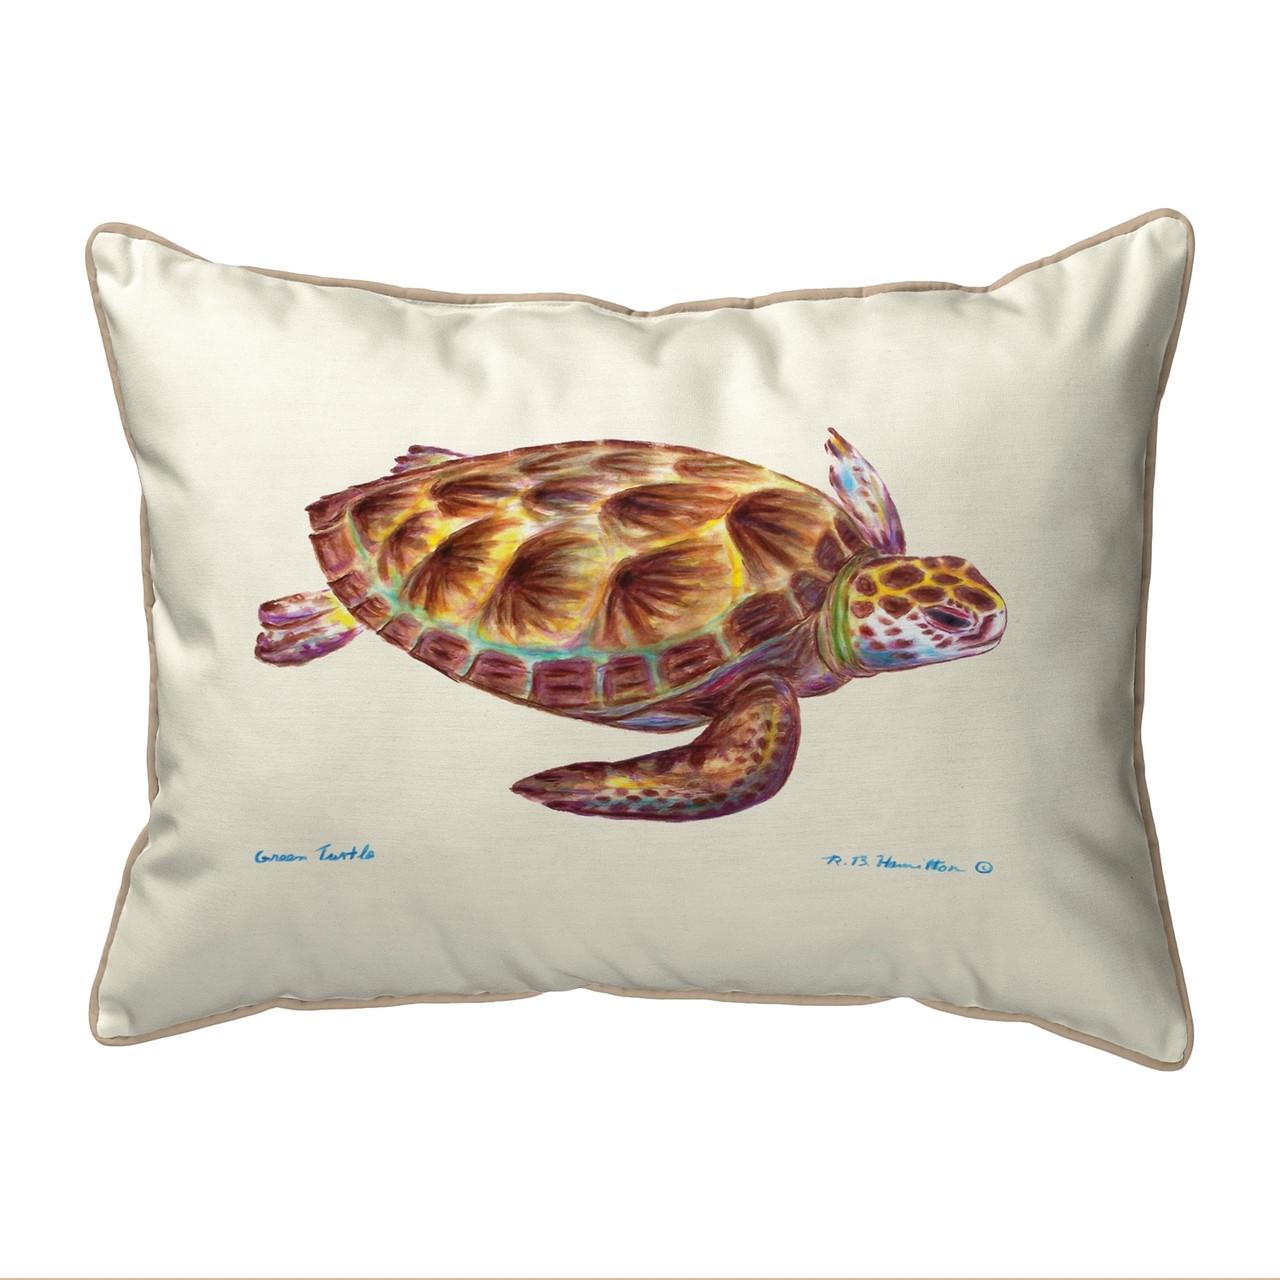 Green Sea Turtle Pillows